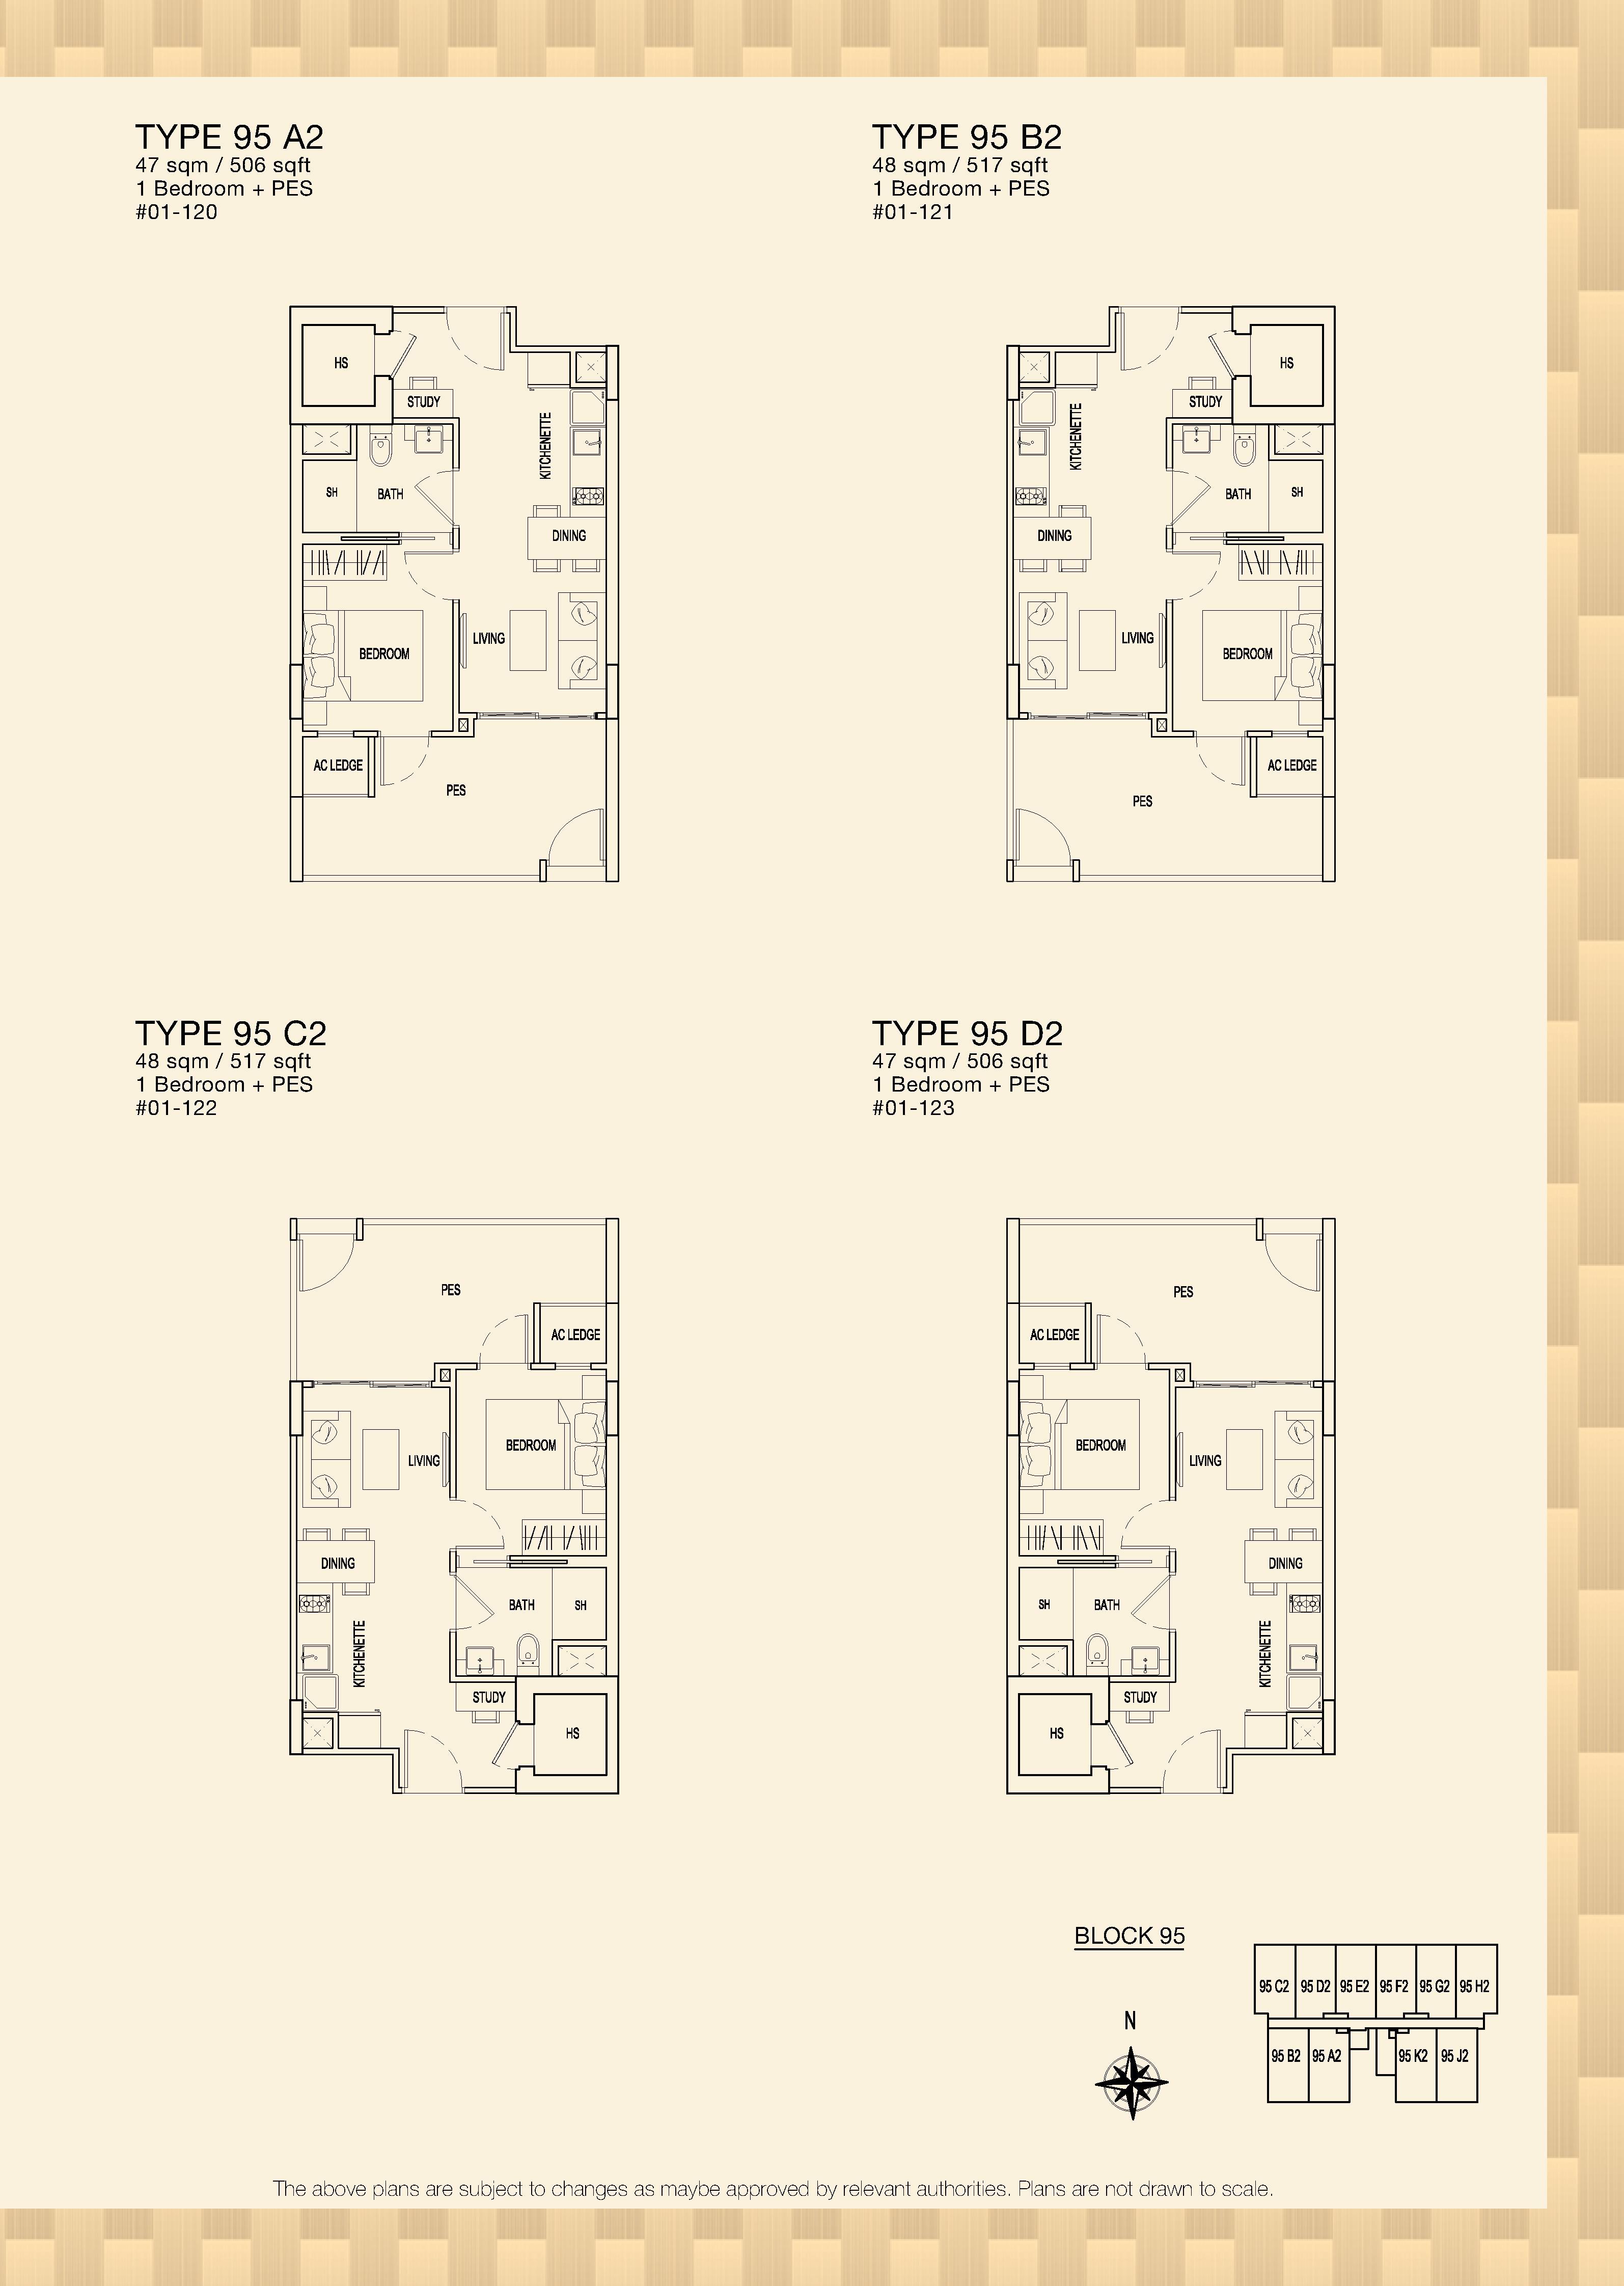 Parc Rosewood Block 95 1 Bedroom PES Type 95 A2, 95 B2, 95 C2